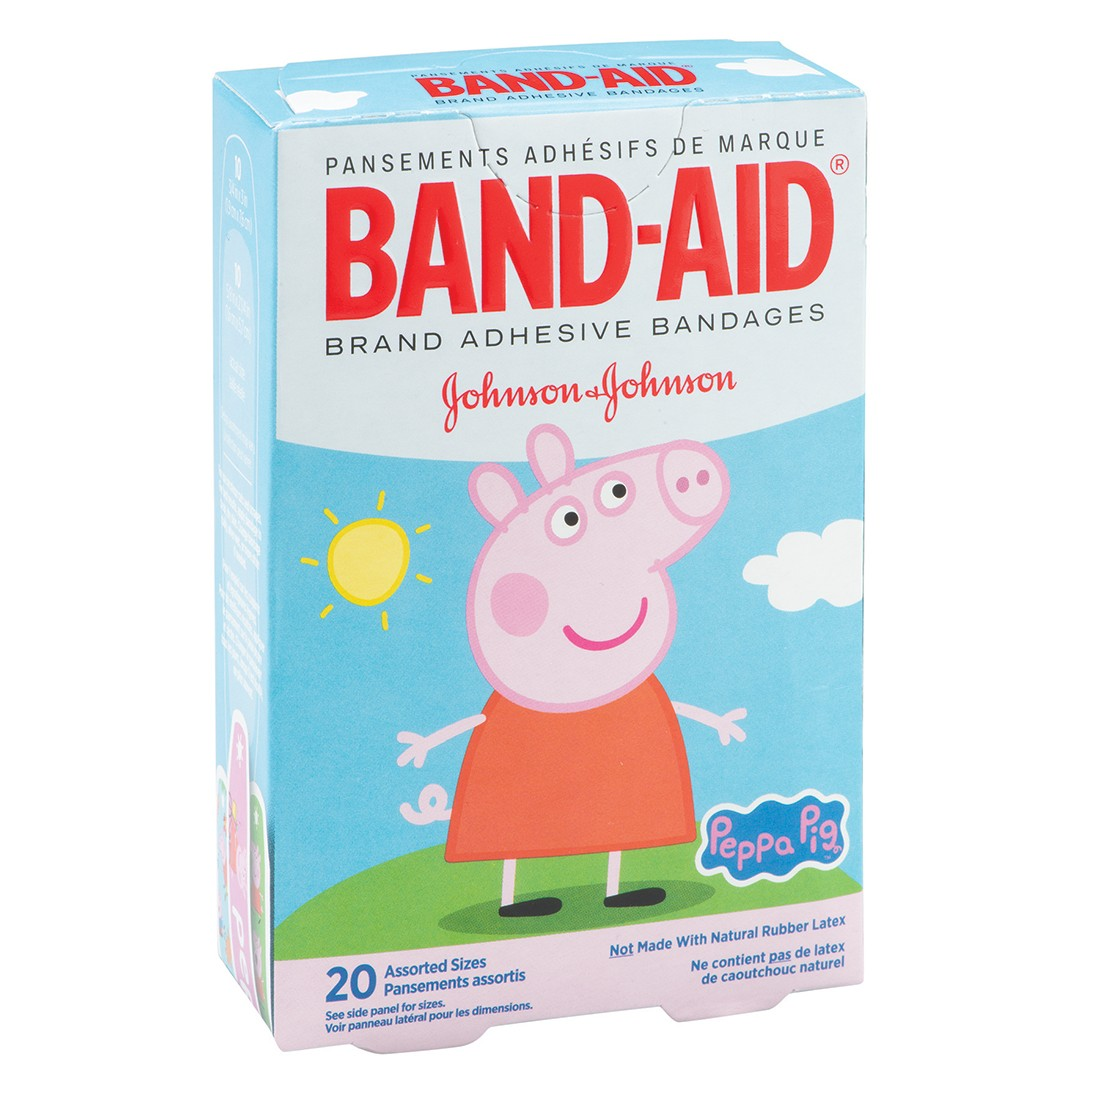 BAND-AID® Peppa Pig Bandages  [image]